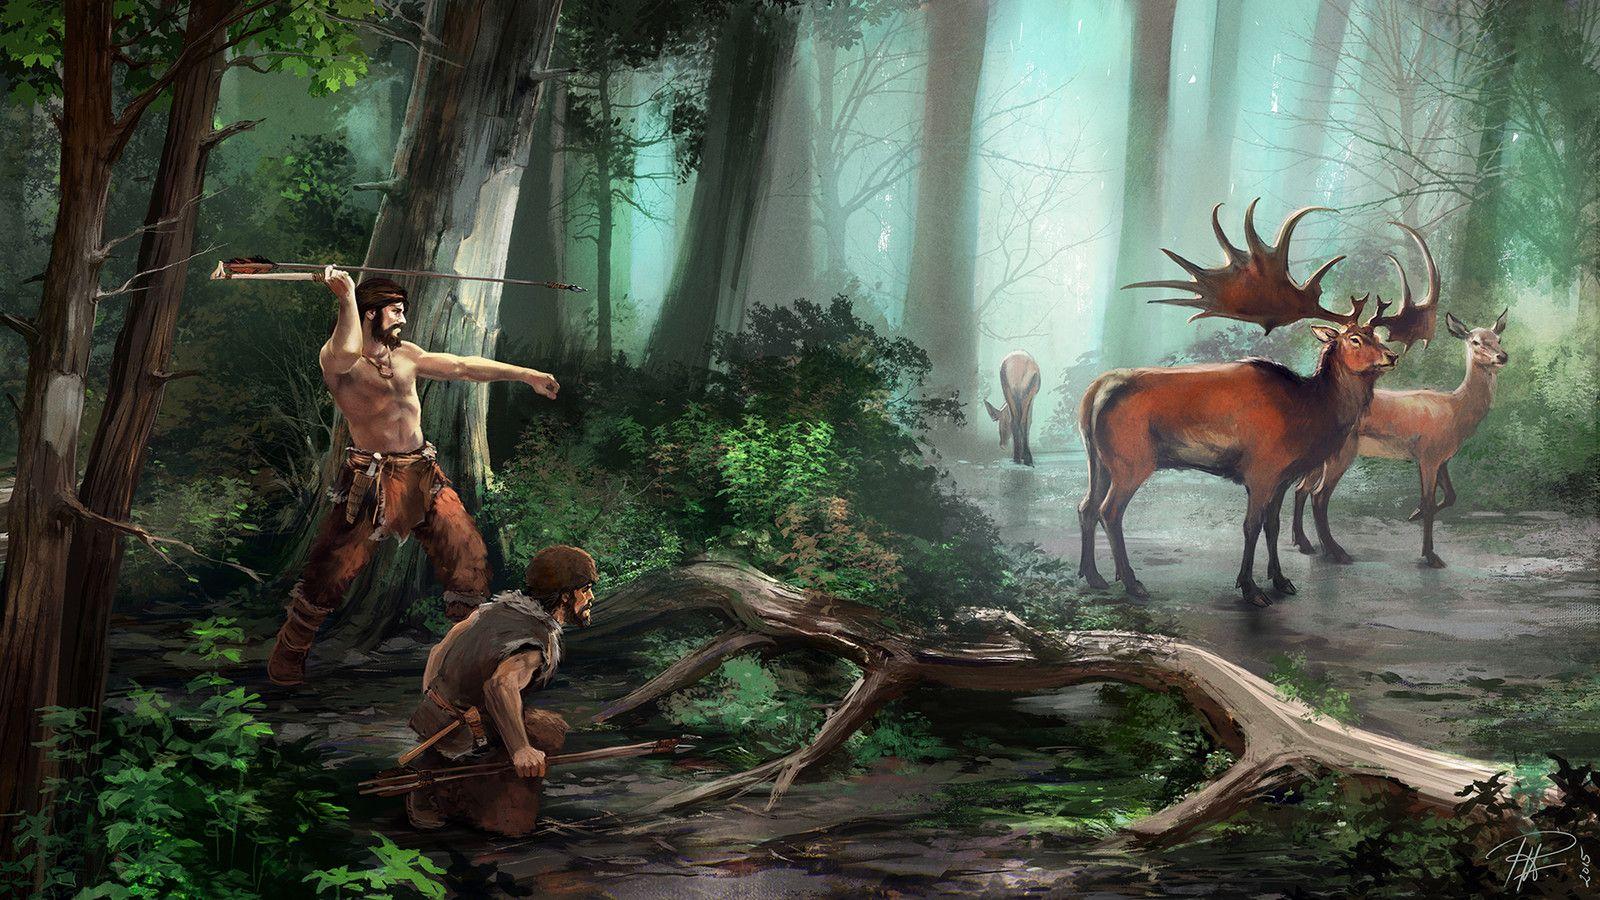 Depiction Of A Megaloceros Hunt In Upper Paleolithic Europe By Ramon Acedo On Artstation